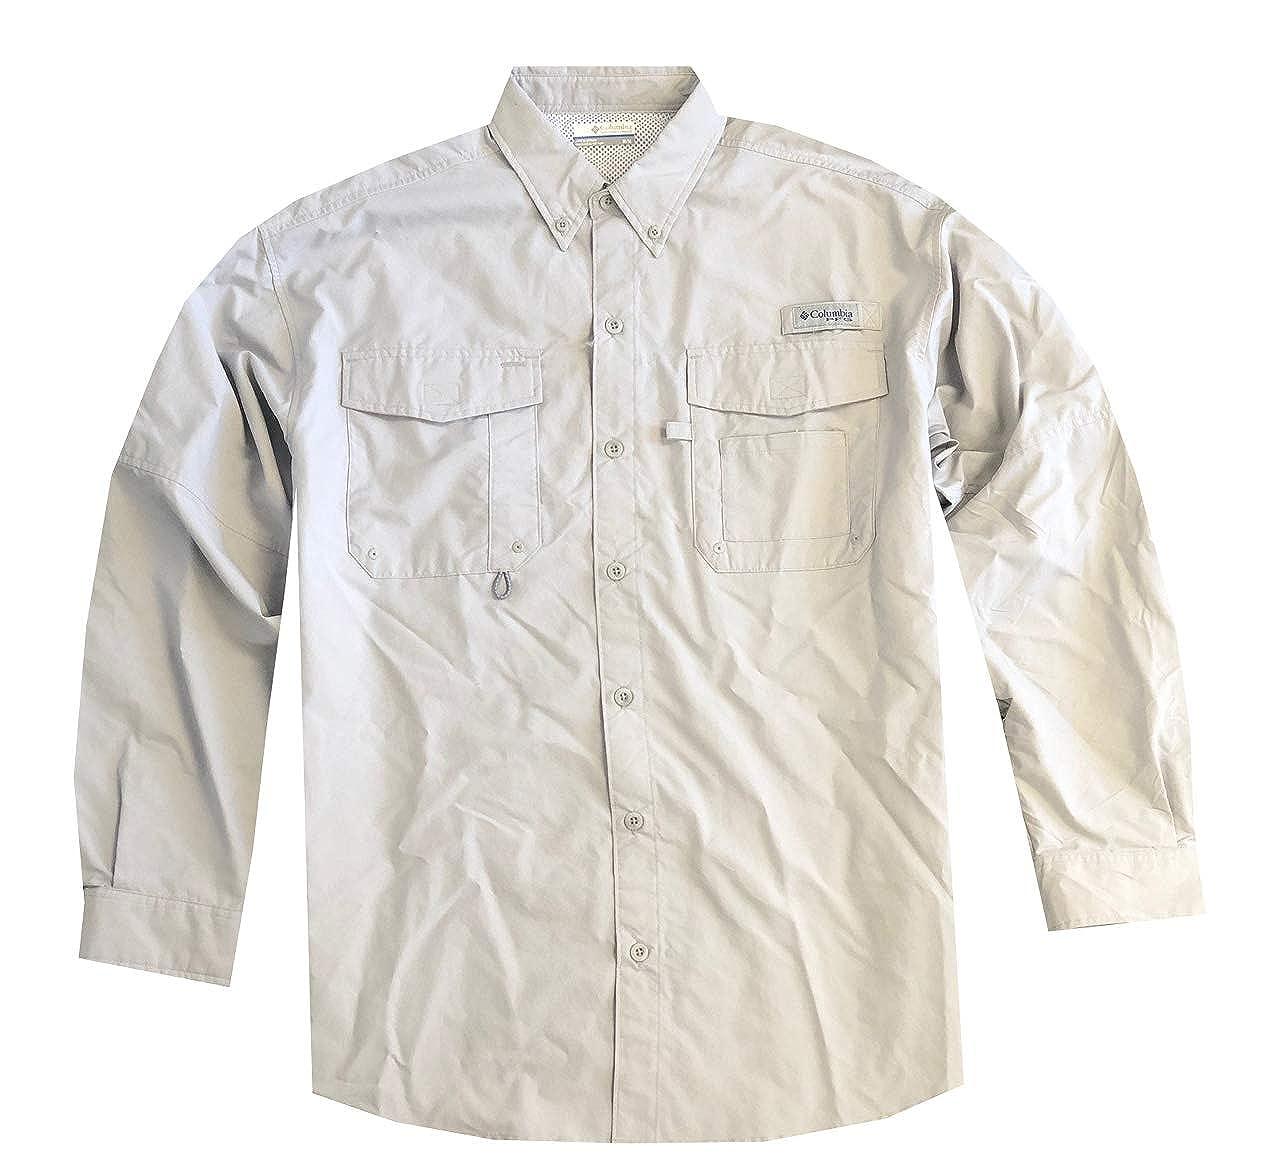 ff60b264f81 Columbia Men's PFG Omni-Shade UPF 30 Distant Water Convertible Sleeve Shirt  at Amazon Men's Clothing store: